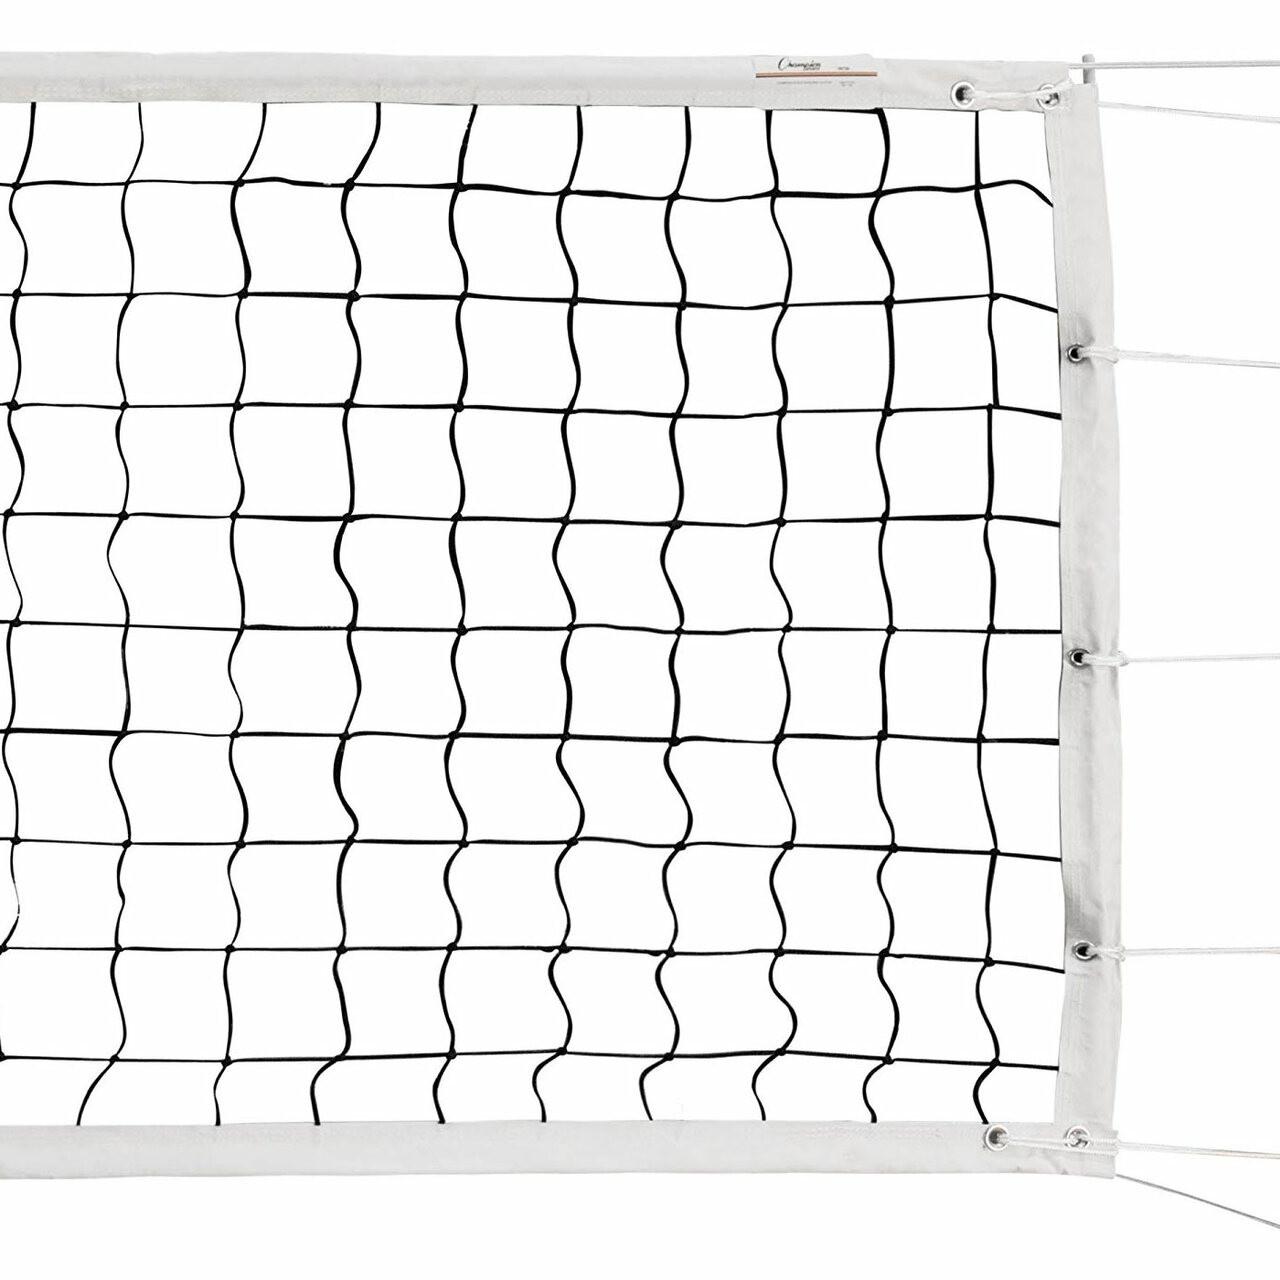 Champion Sports VN600 Tournament Power Volleyball Net